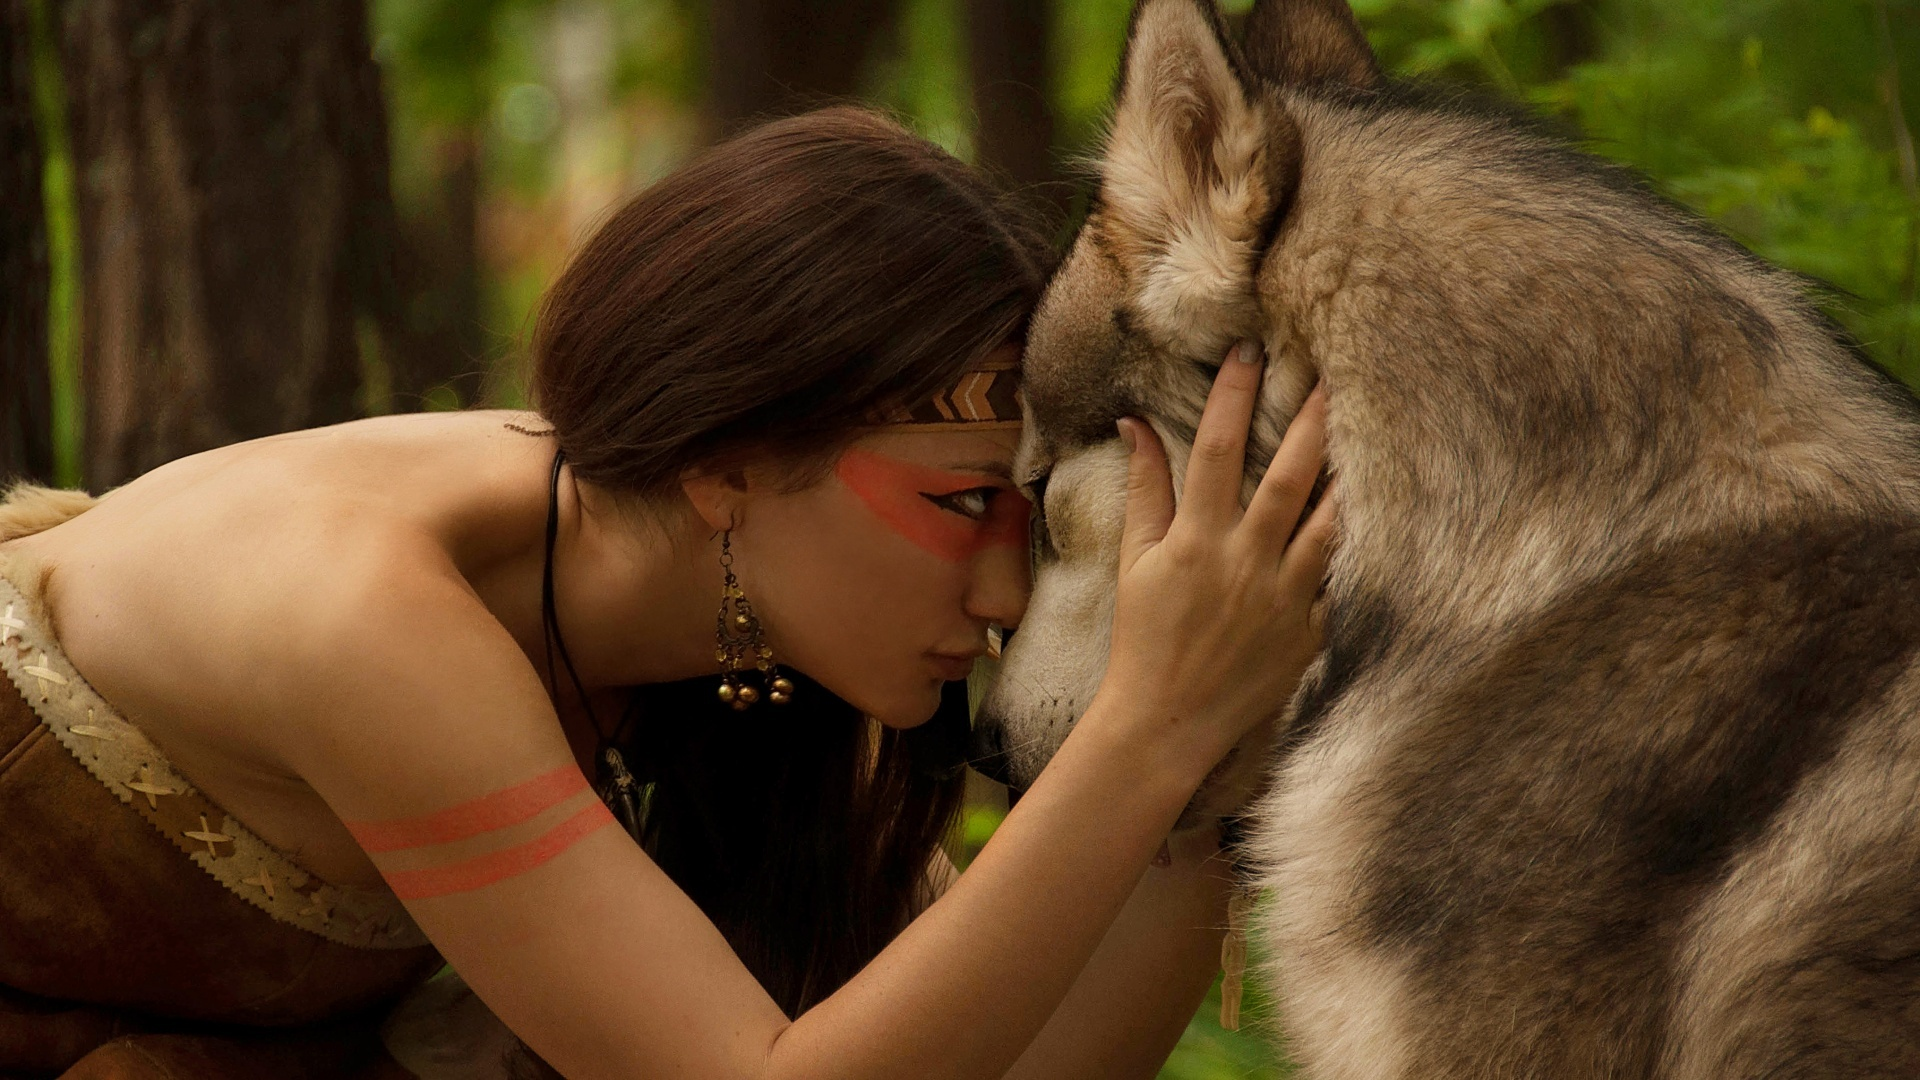 Волк защищает девушку фото